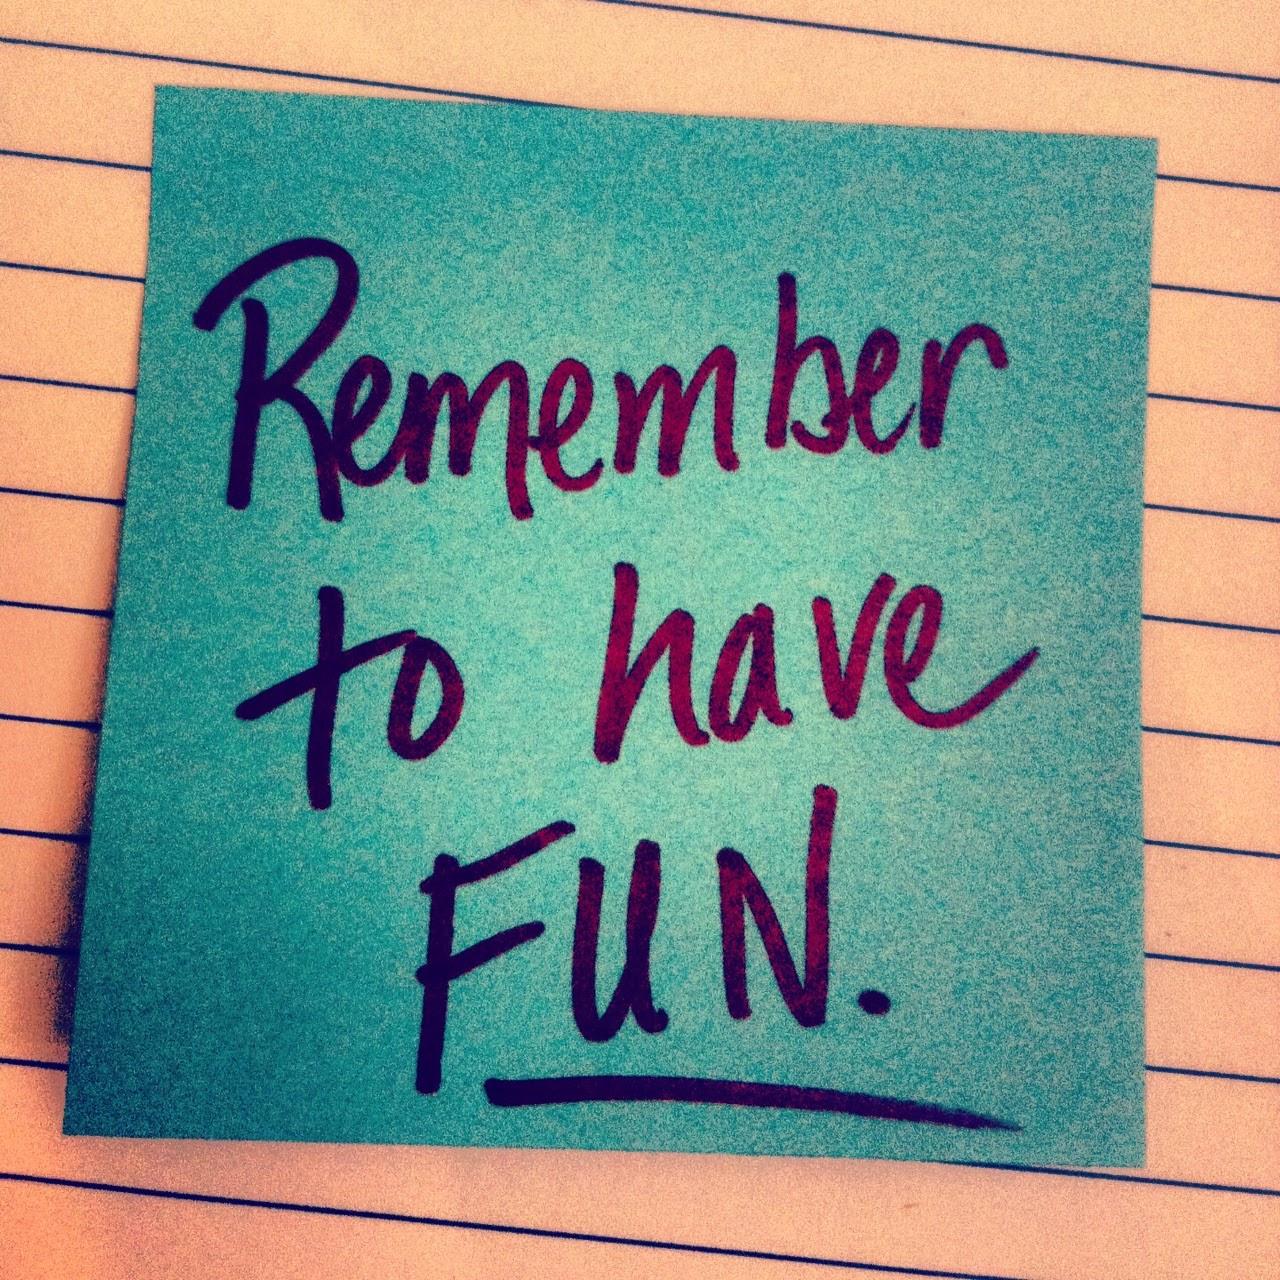 http://3.bp.blogspot.com/-t-6oyY5Nohw/U4xUN41bdeI/AAAAAAAADcs/cqmP1YXA2YU/s1600/remember-to-have-fun.jpg-@-stephaniesaye.com-.jpg